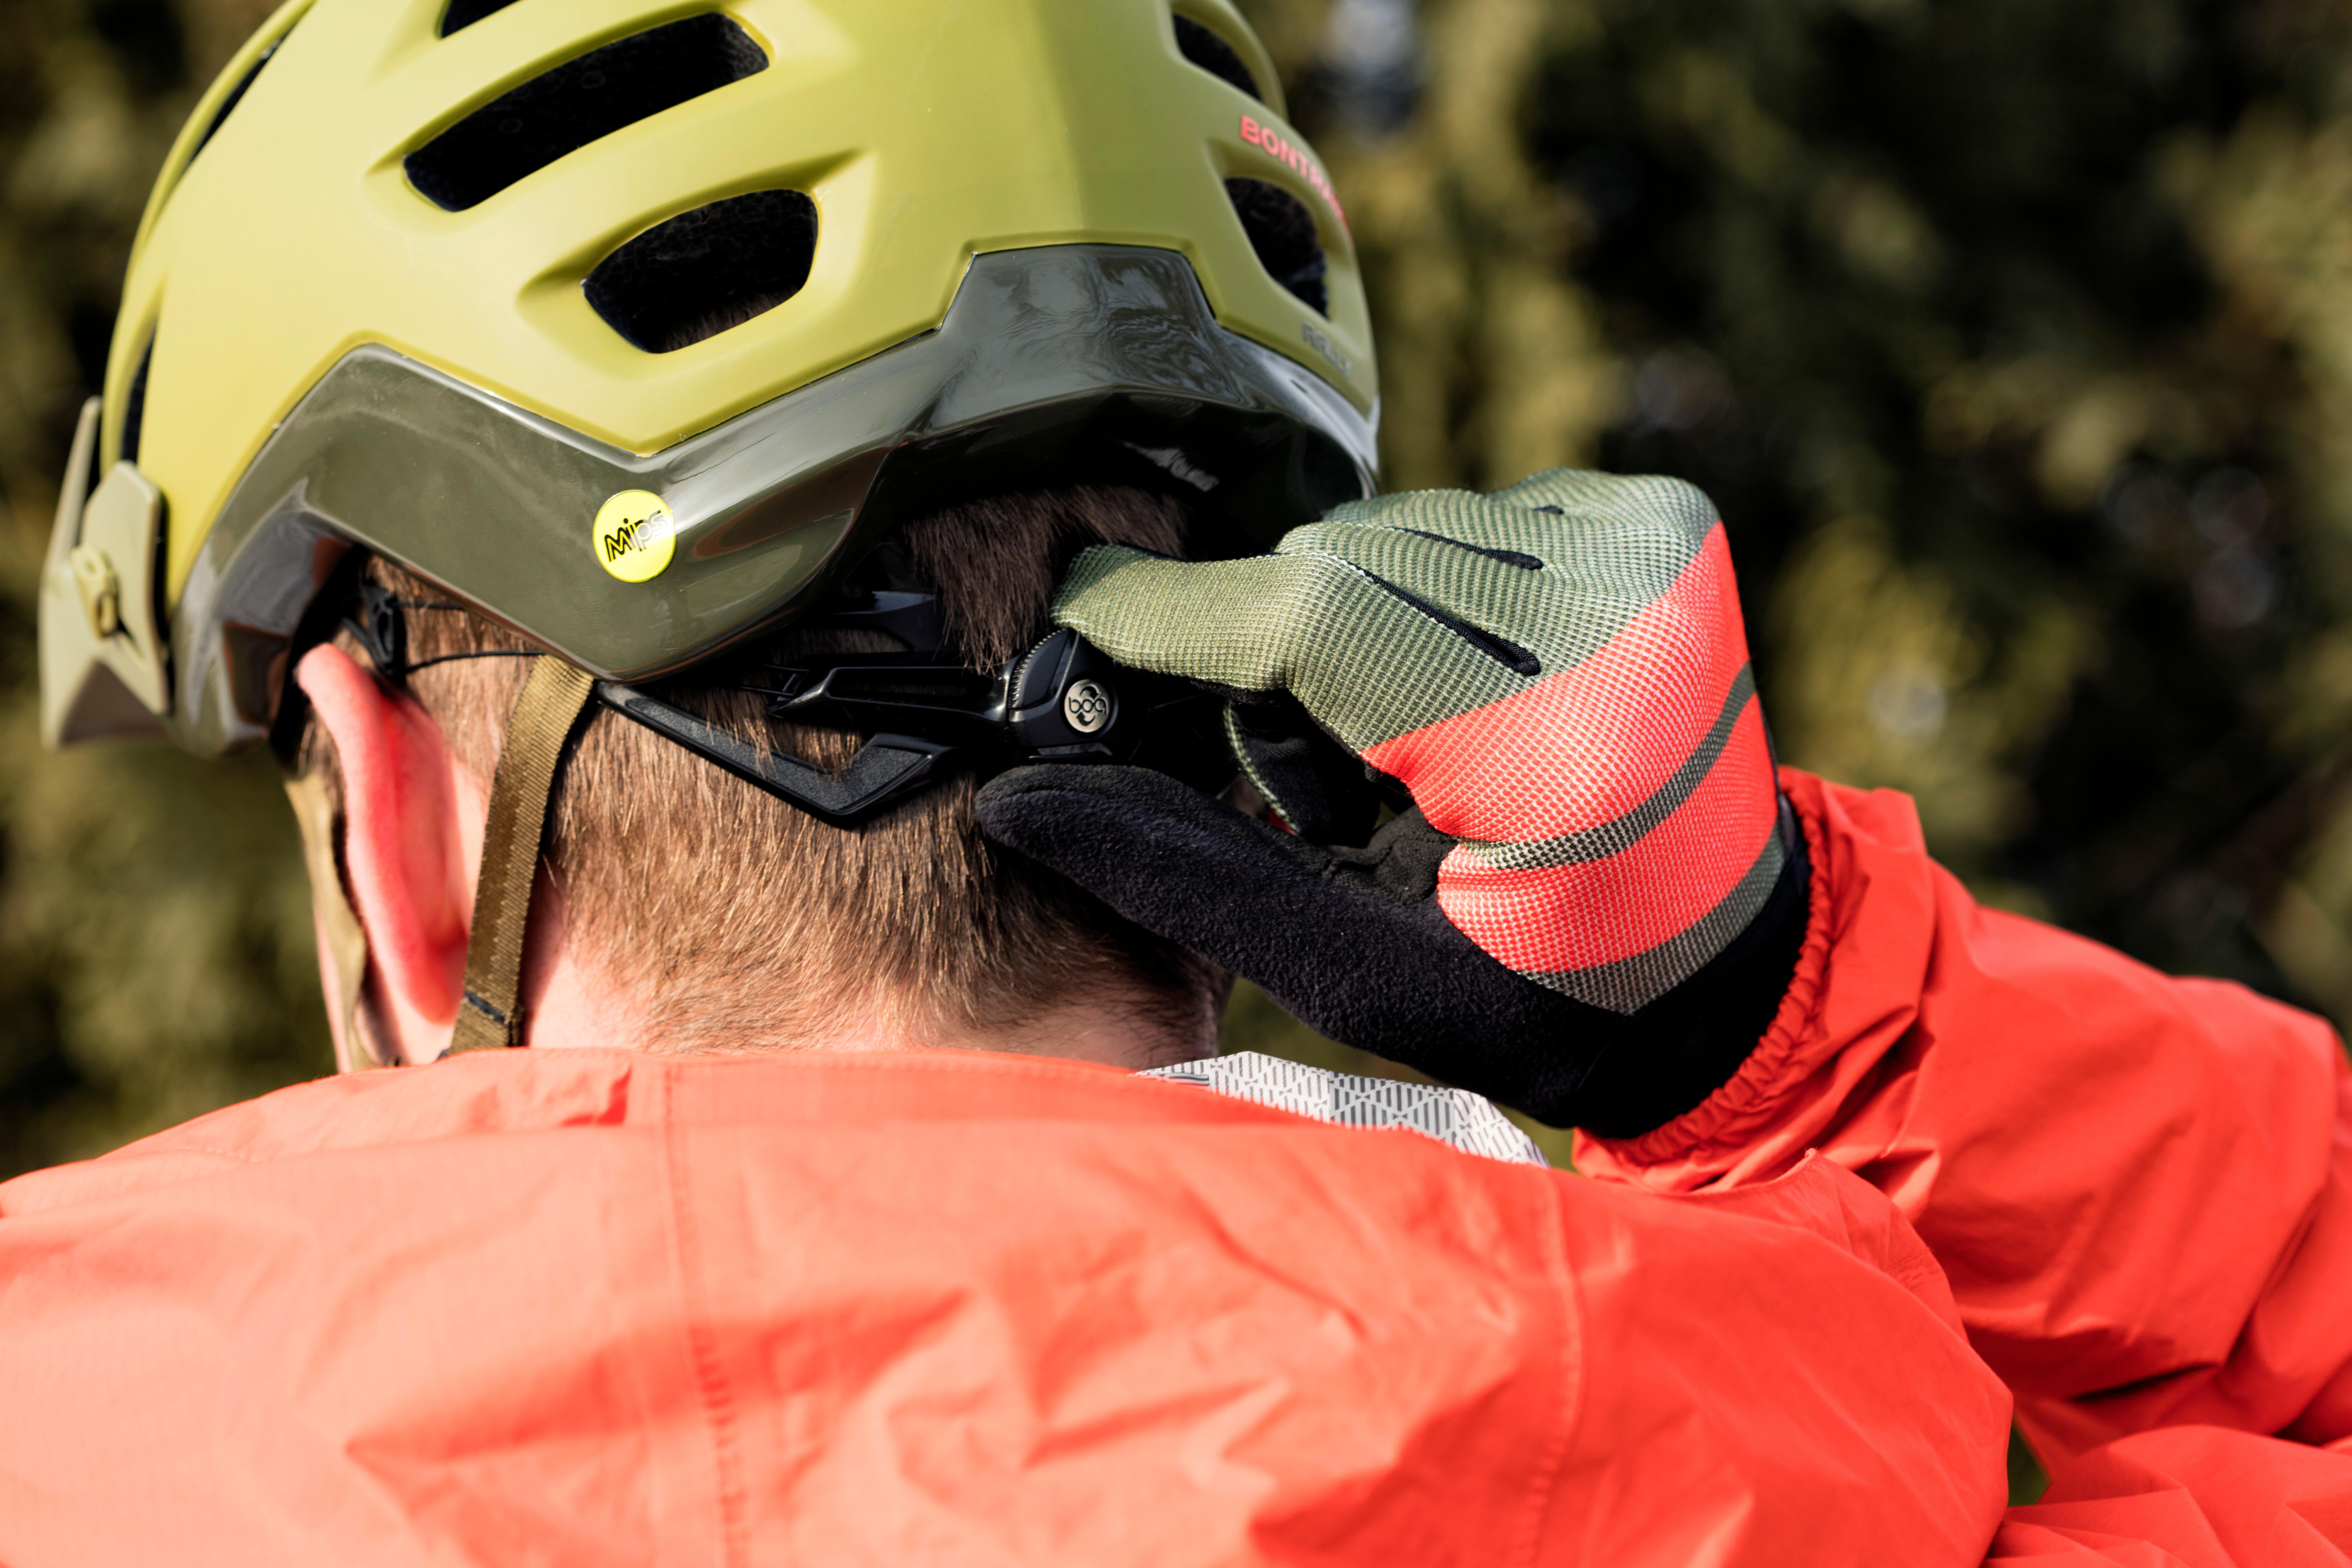 Bontrager_Helmet_&_Light_Mount_Detail-2673_mr